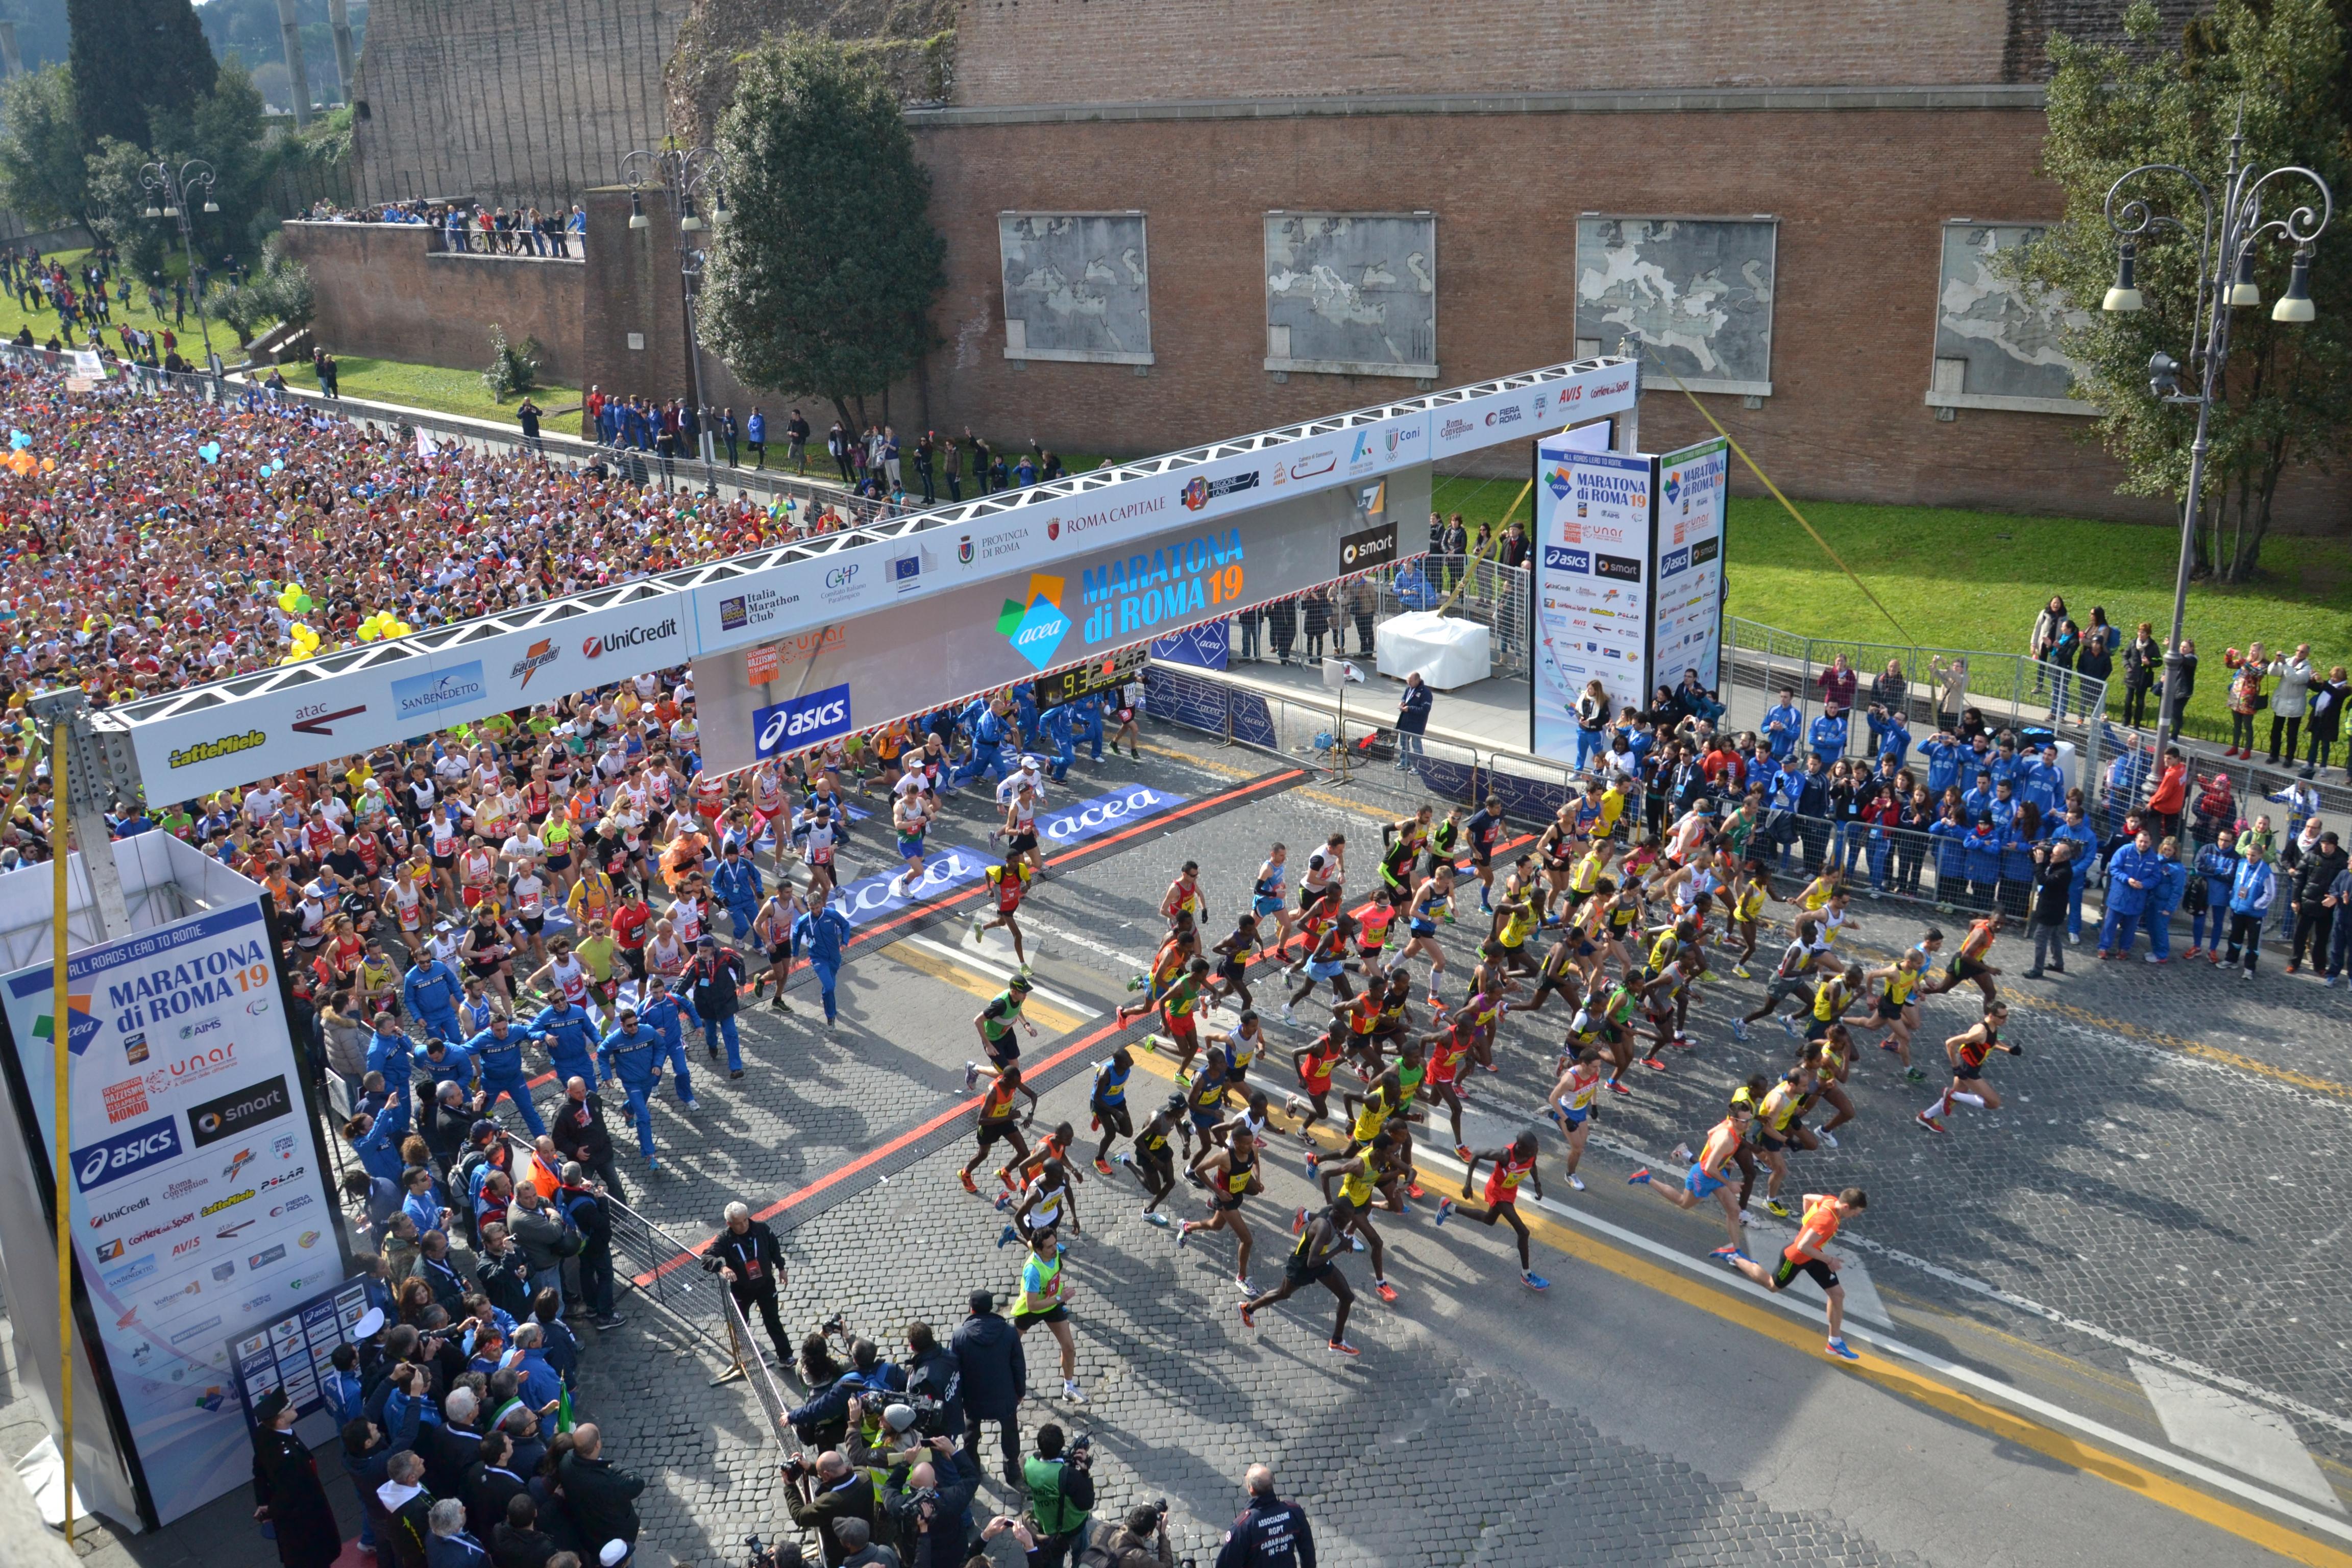 maratona-di-roma-2013-200